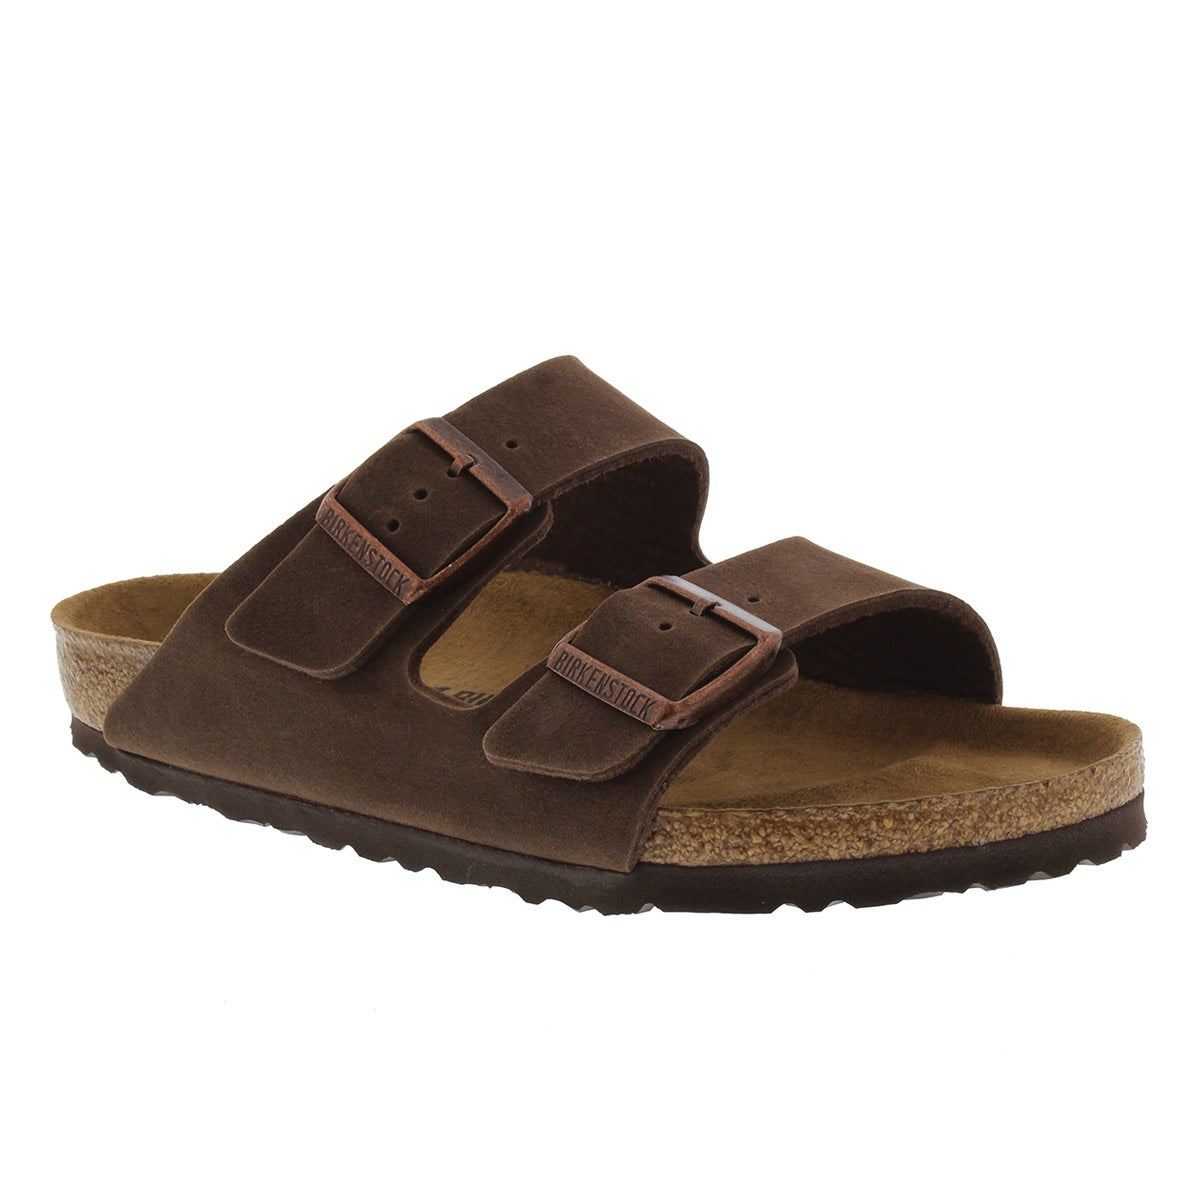 Lds Arizona Vegan cocoa slide sandal